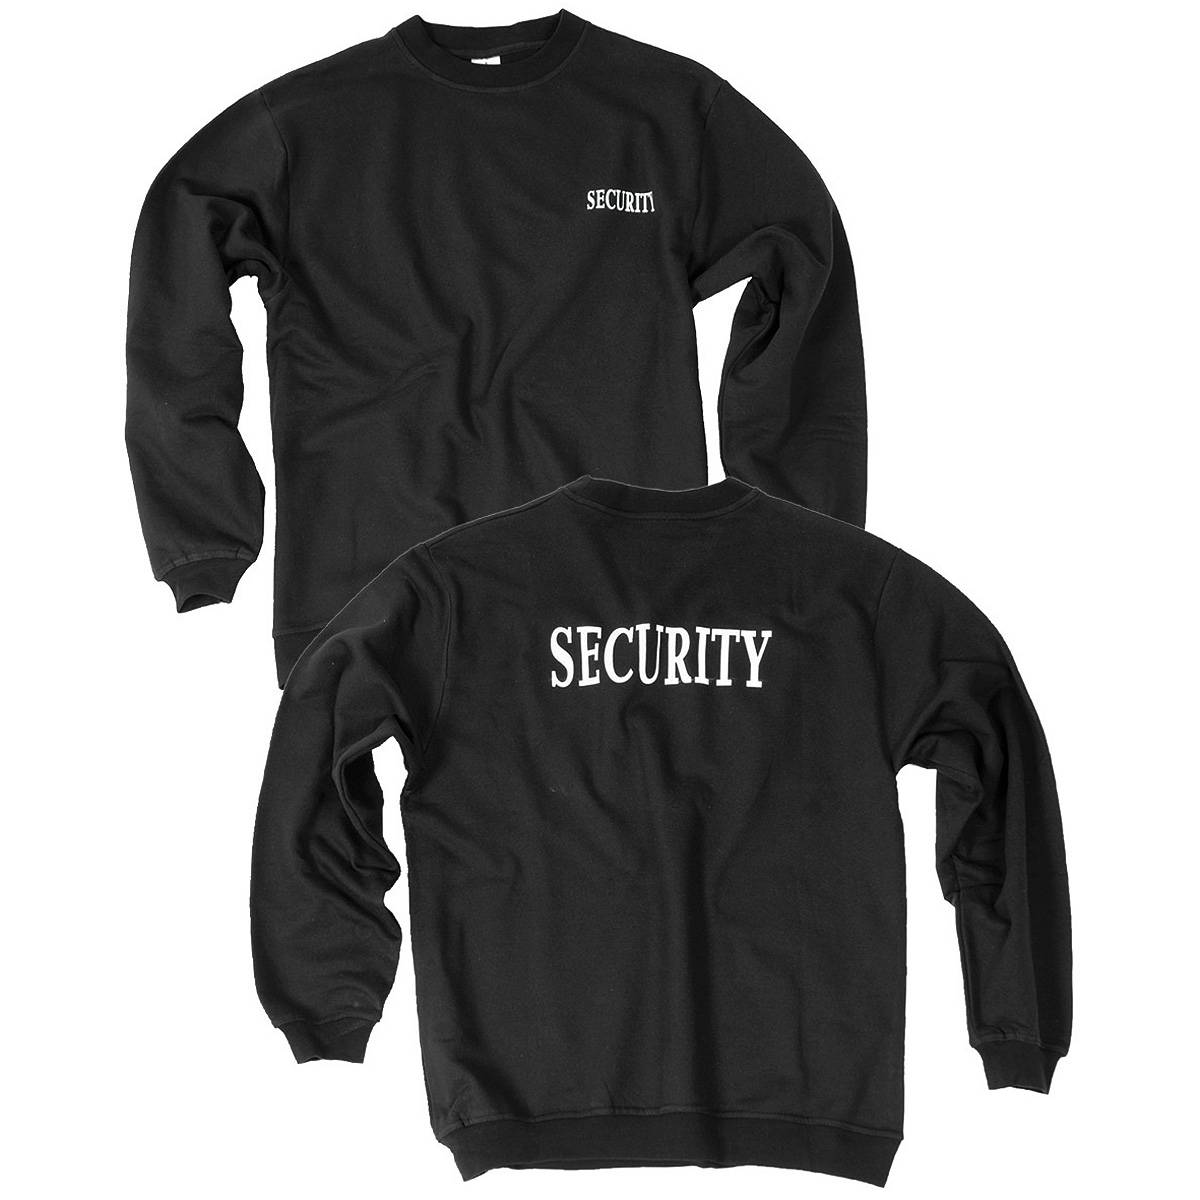 security sweatshirt schwarz xxl der gro e bundeswehr shop army sho 22 90. Black Bedroom Furniture Sets. Home Design Ideas